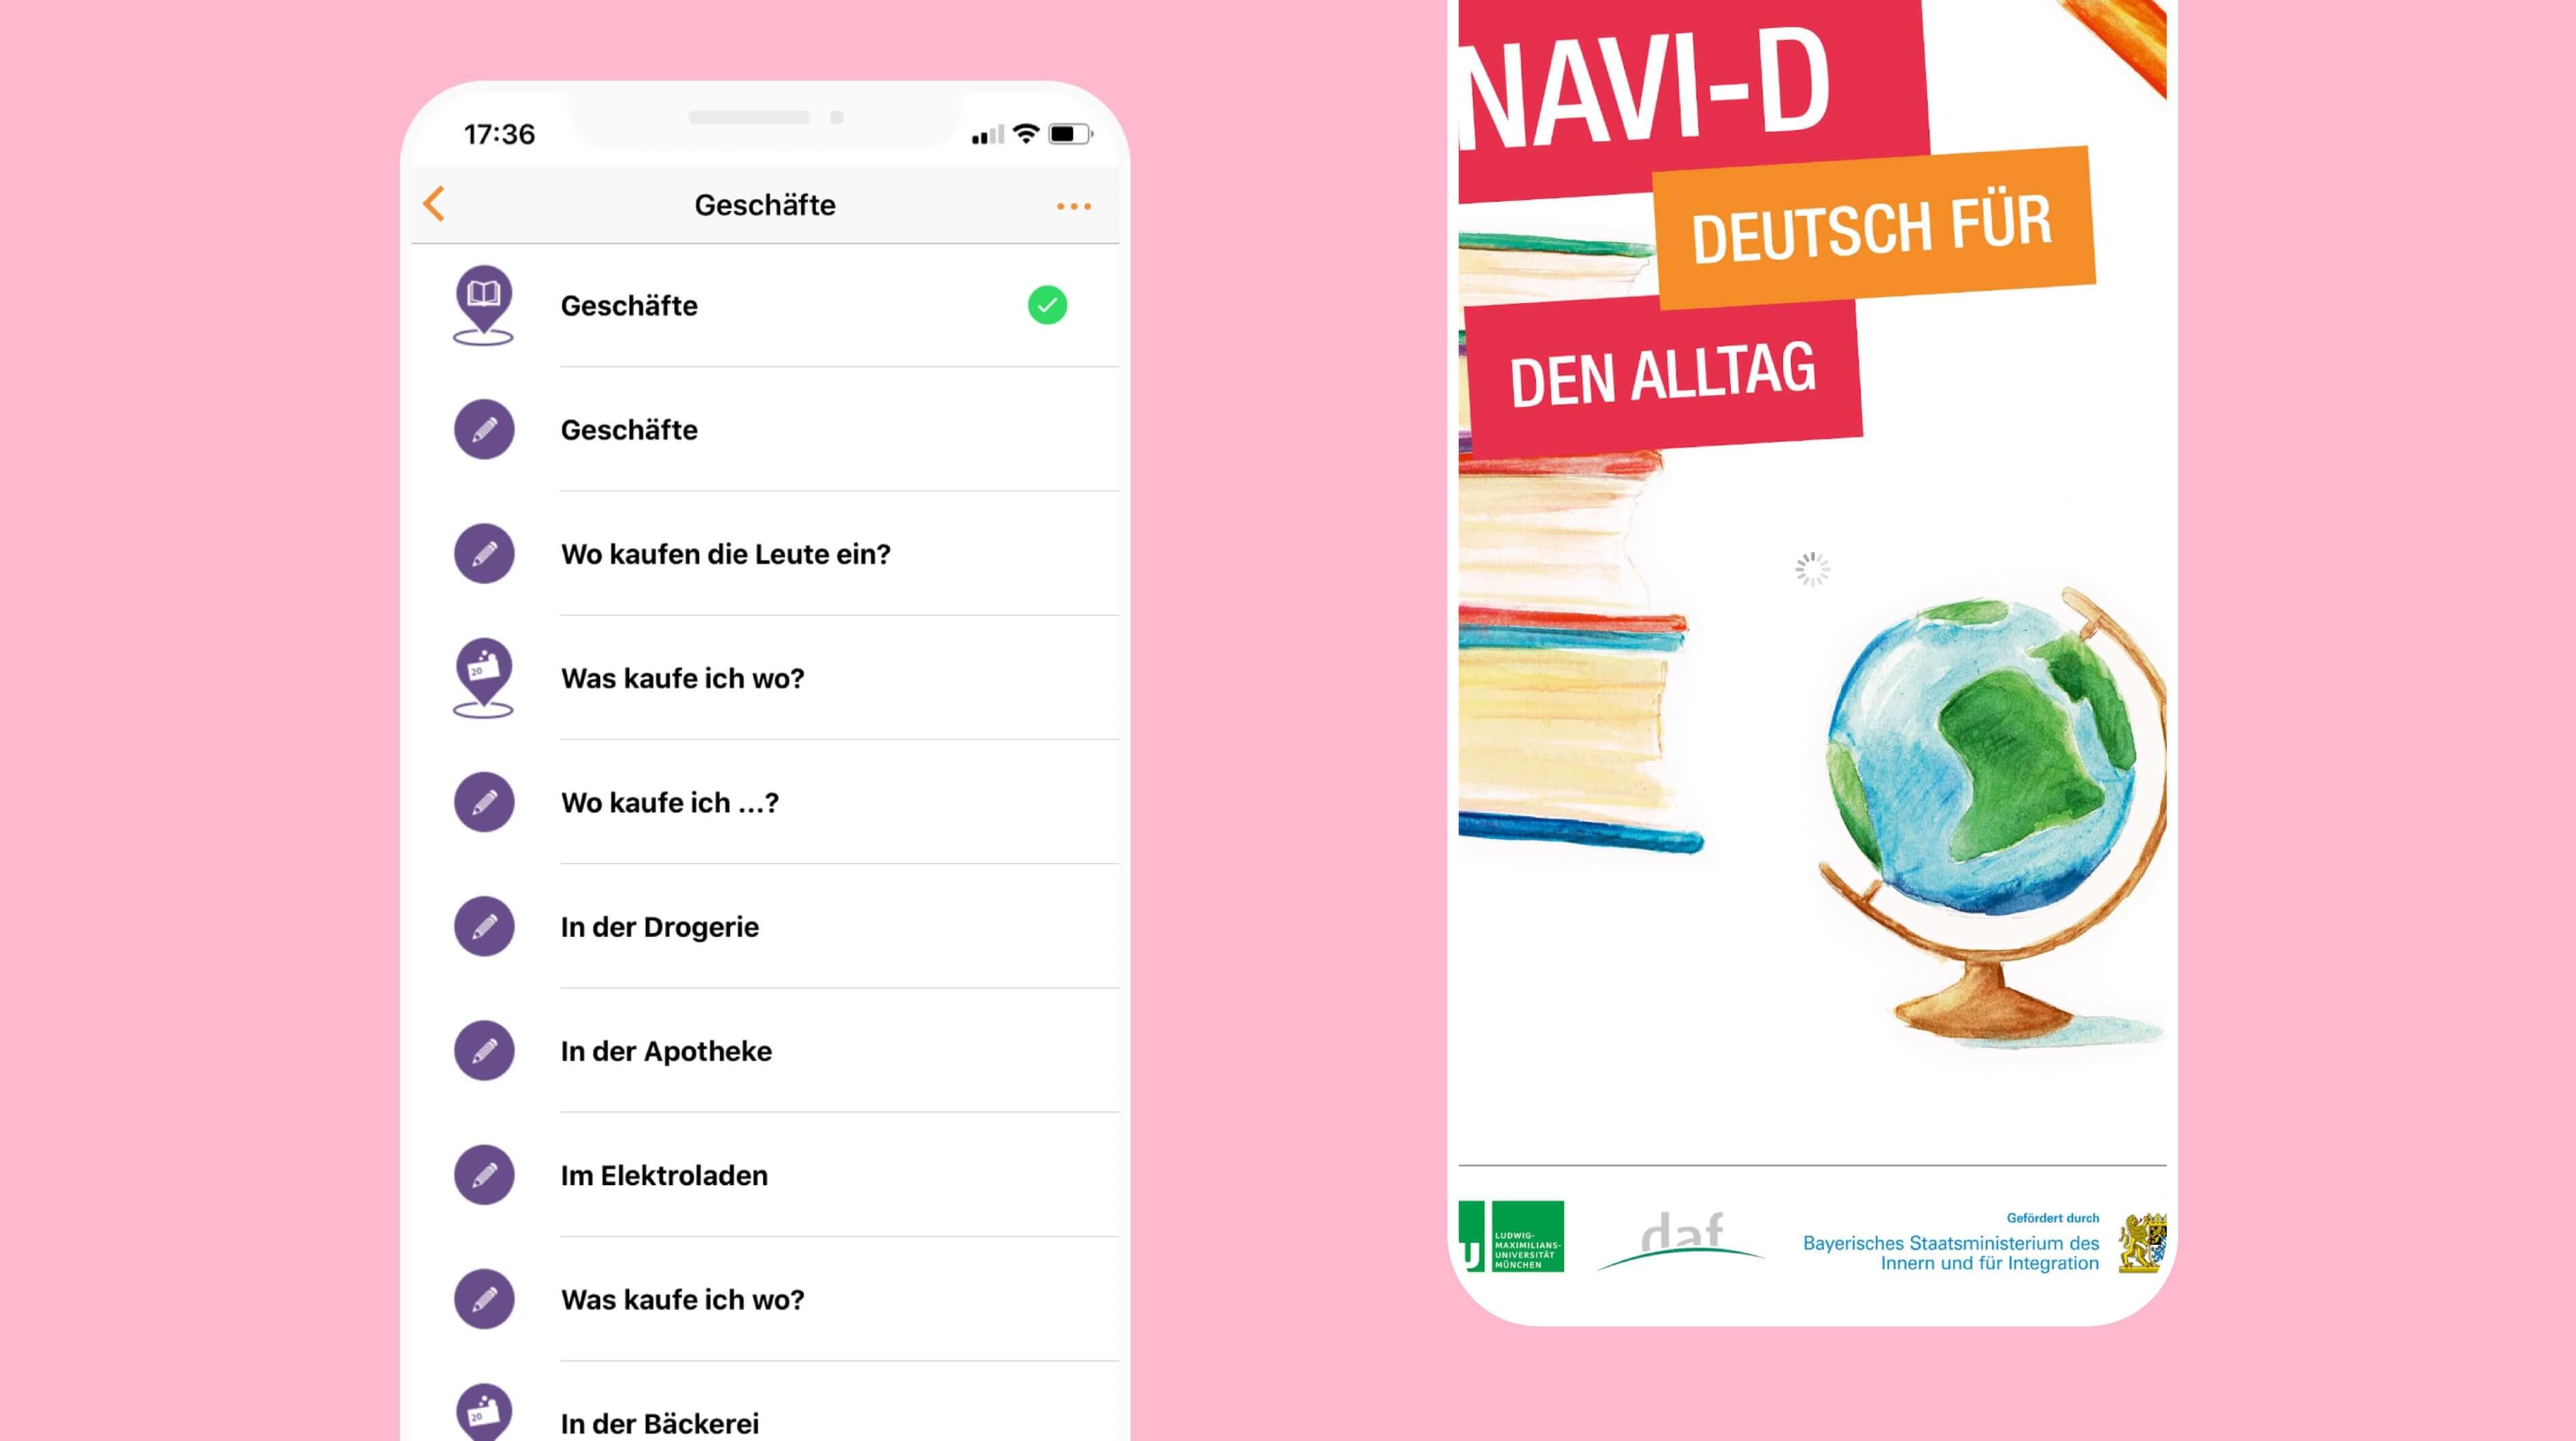 NAVI-D